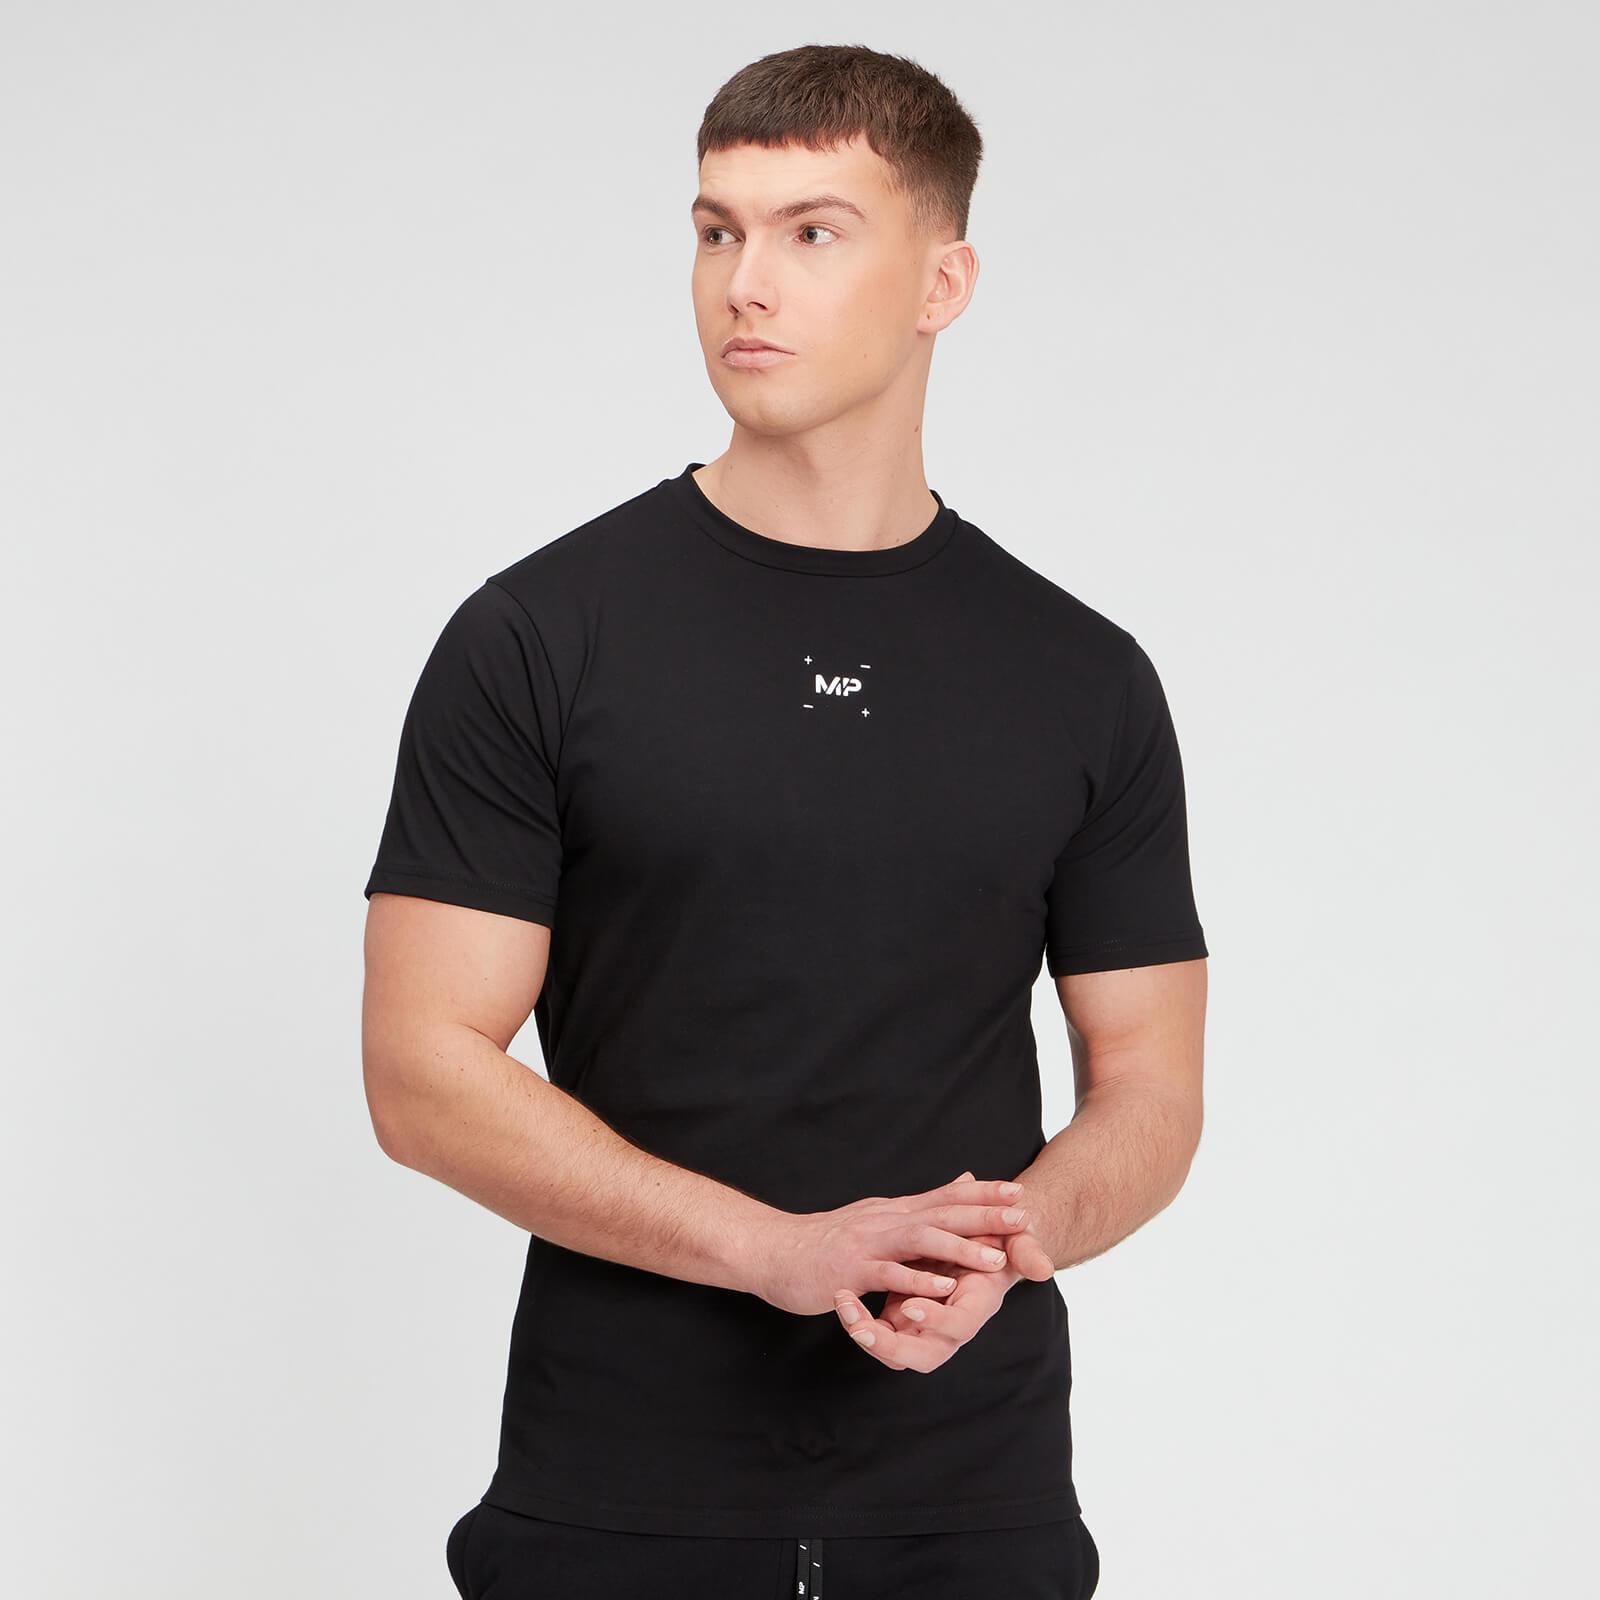 Купить MP Men's Central Graphic Short Sleeve T-Shirt - Black - XXL, Myprotein International